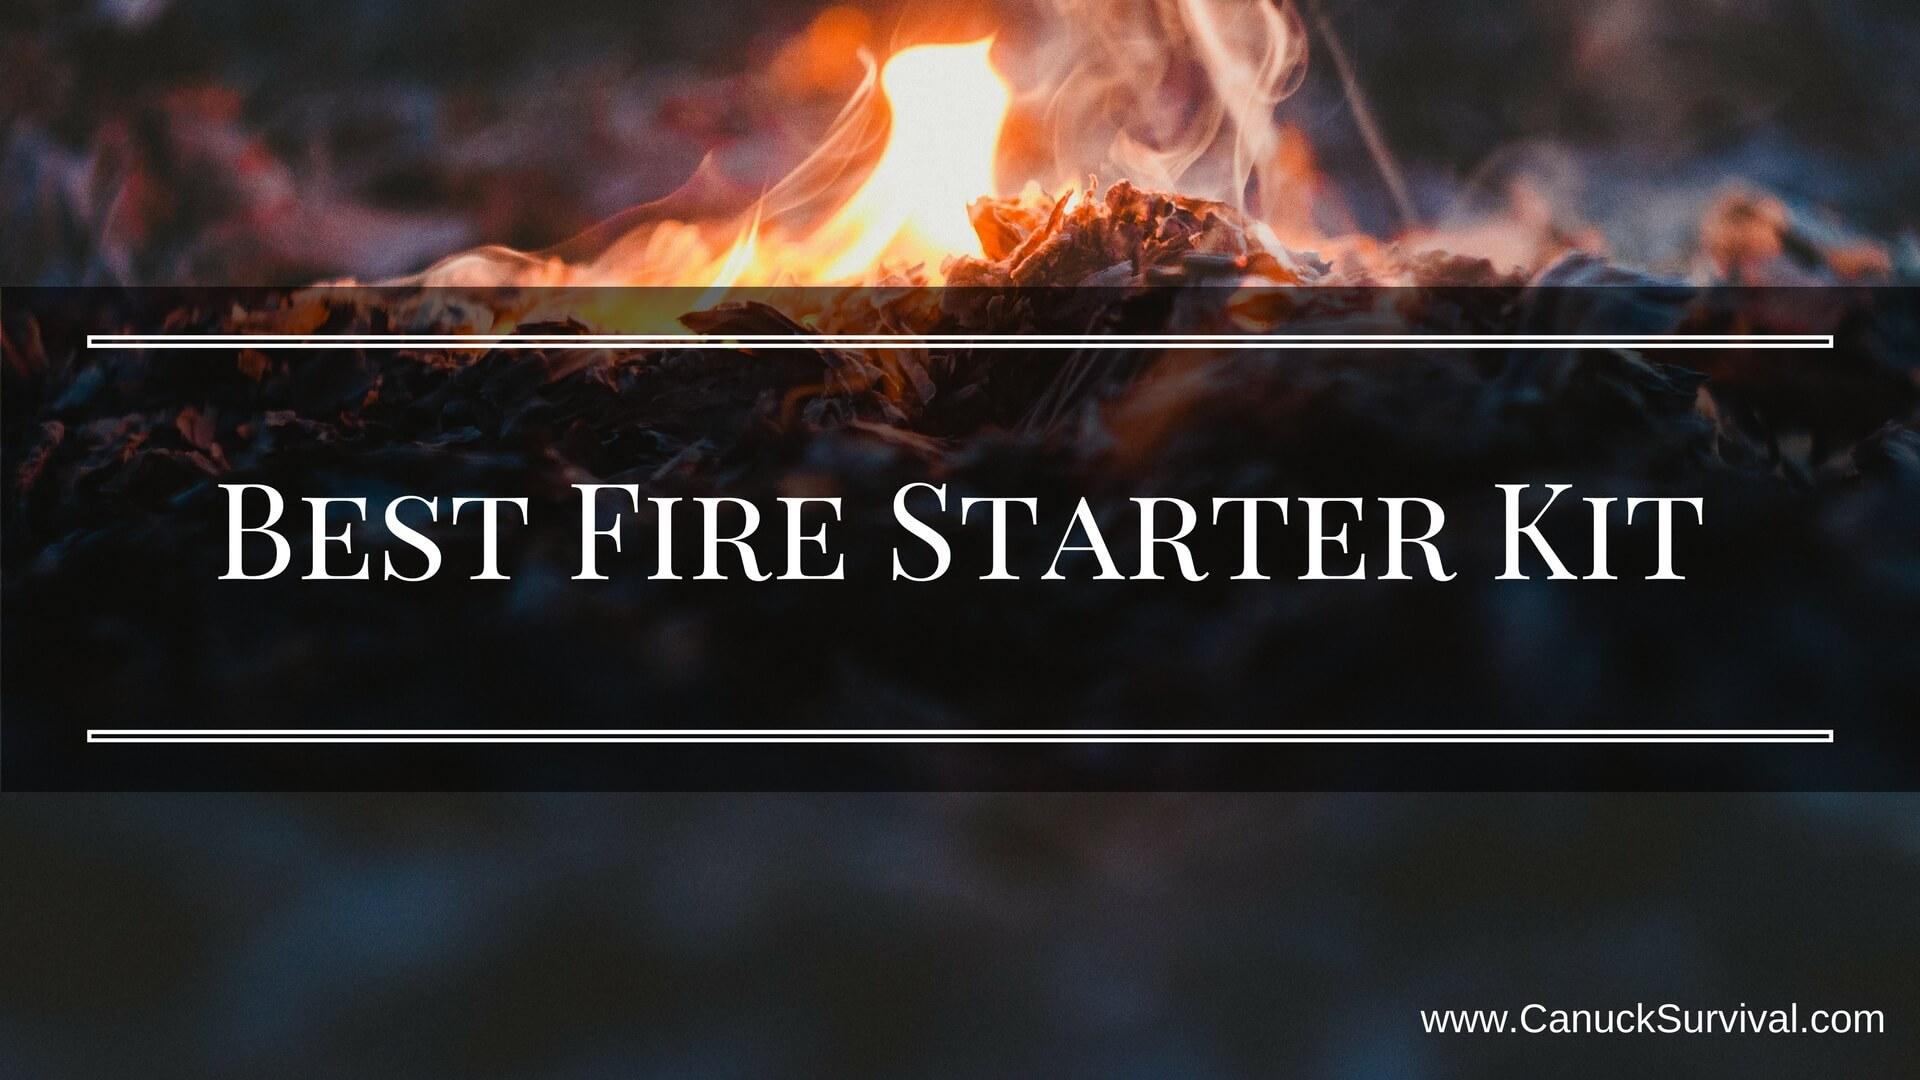 Best Fire Starter Kit